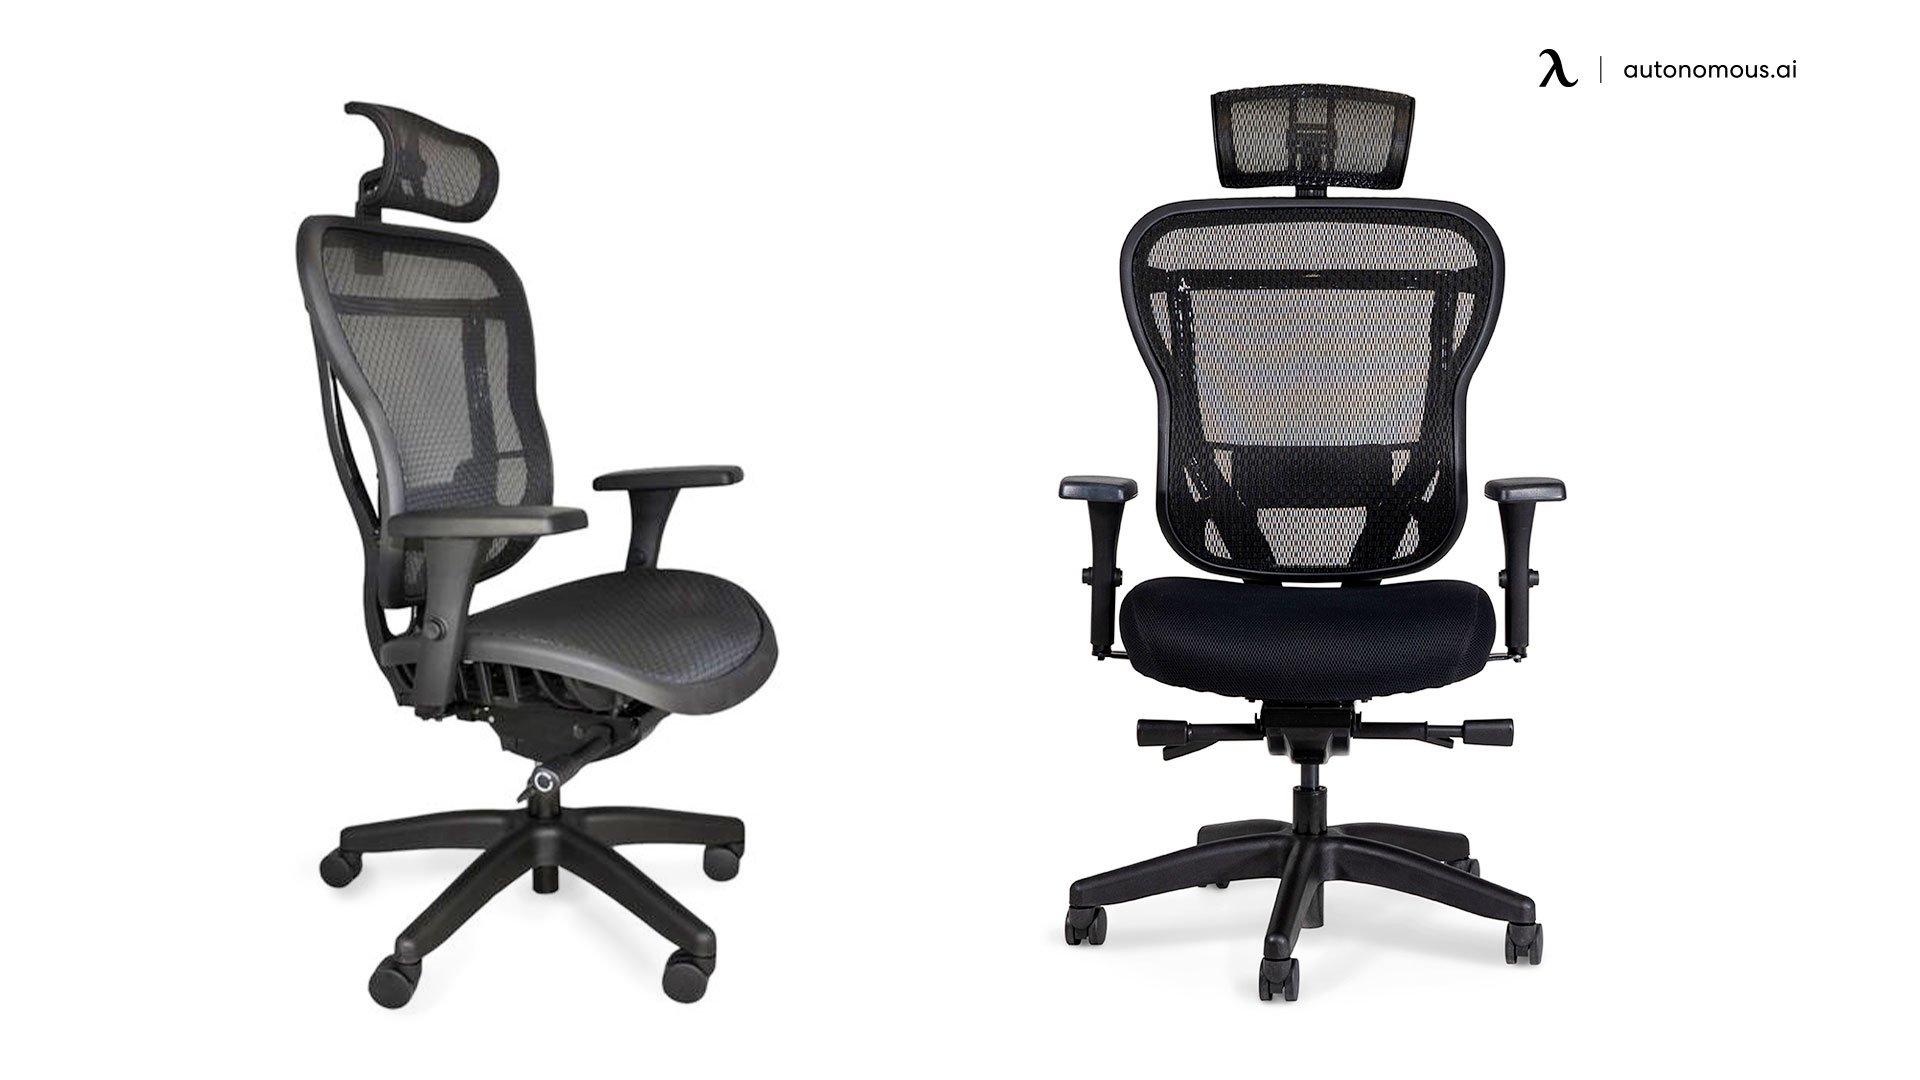 Akir Chair by BTOD